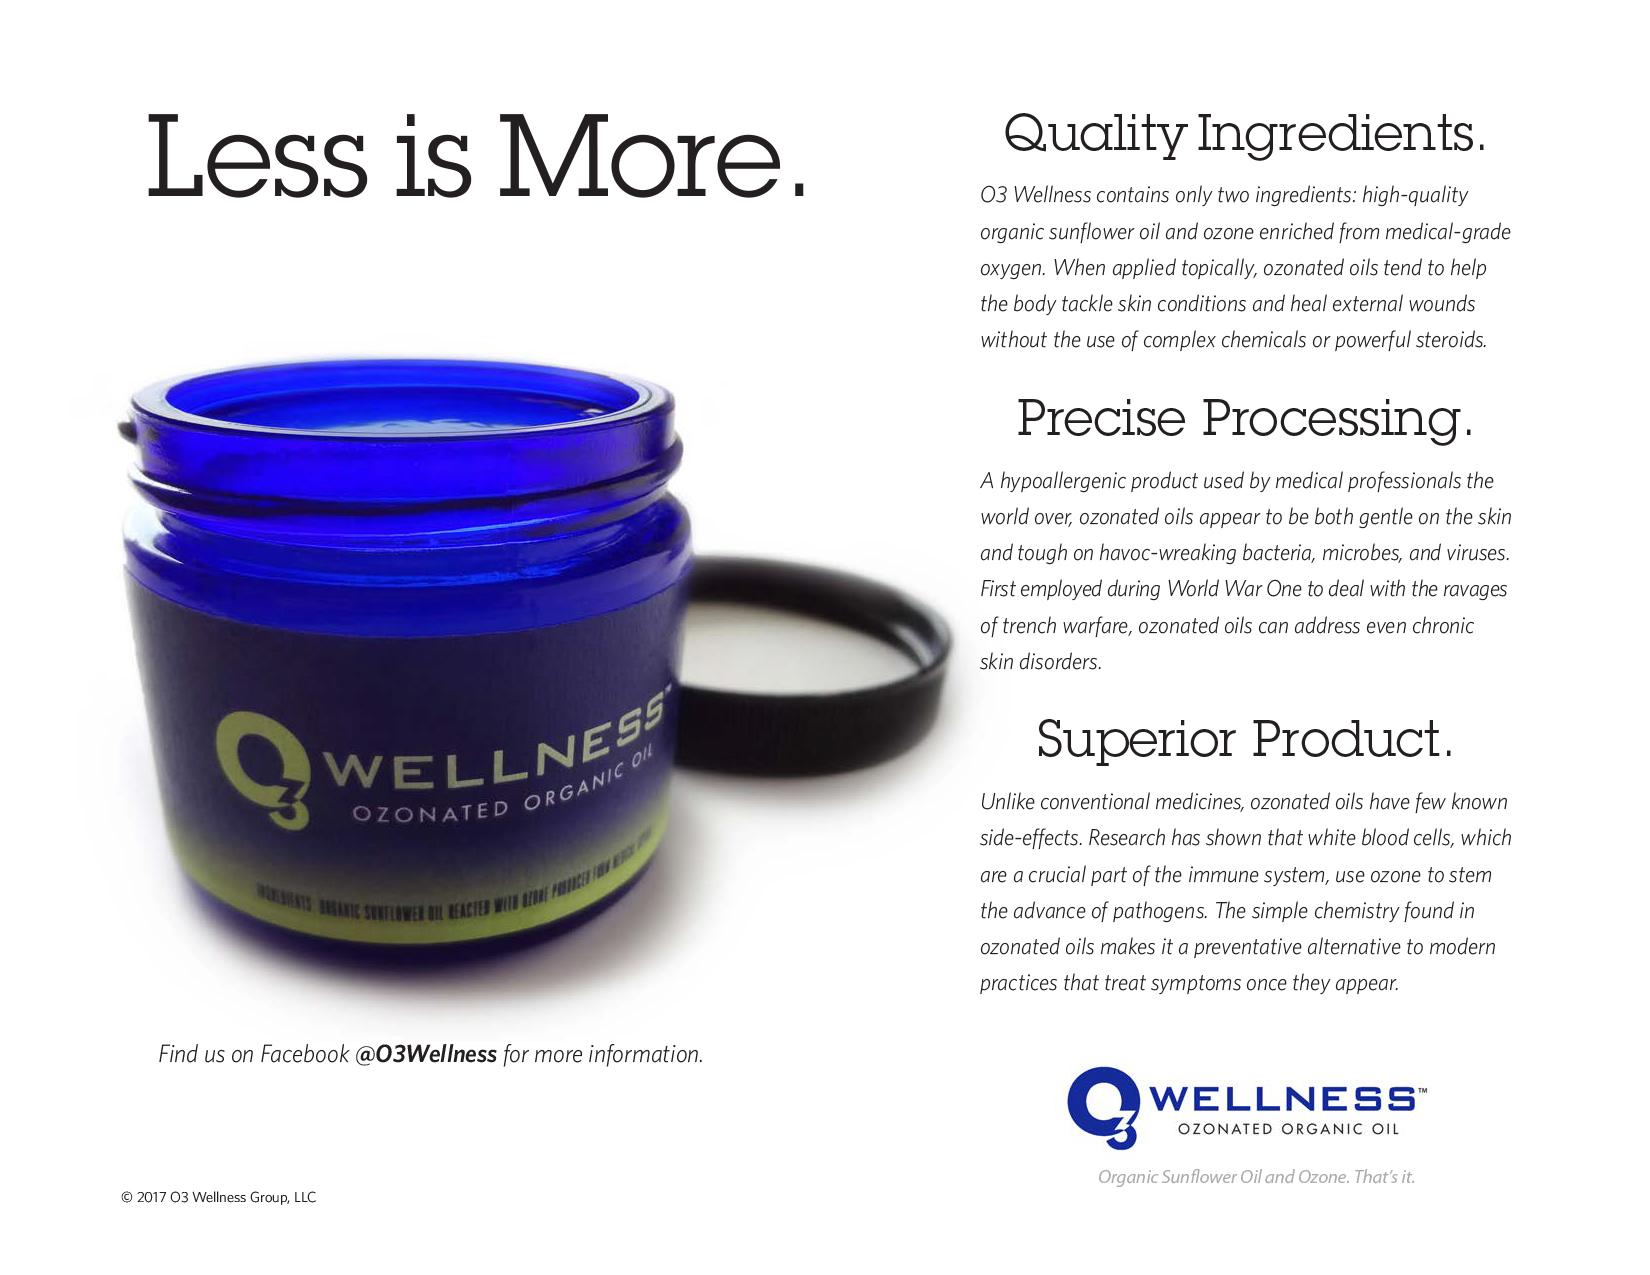 O3 Wellness Horizontal Ad170802.jpg